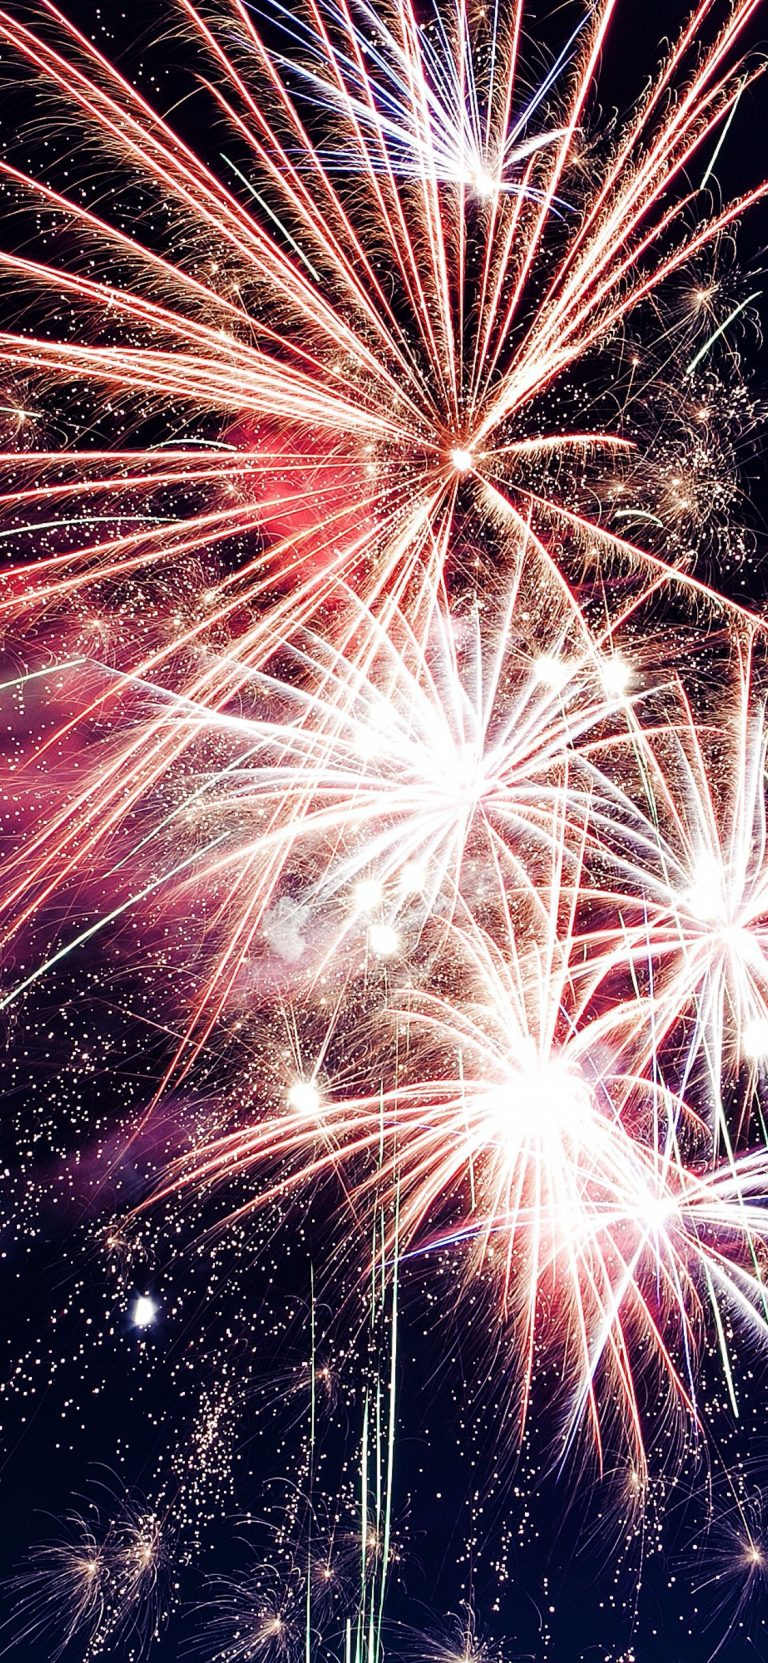 Nye Iphone Wallpaper Fireworks Wallpaper Iphone Fireworks Wallpaper Iphone Wallpaper